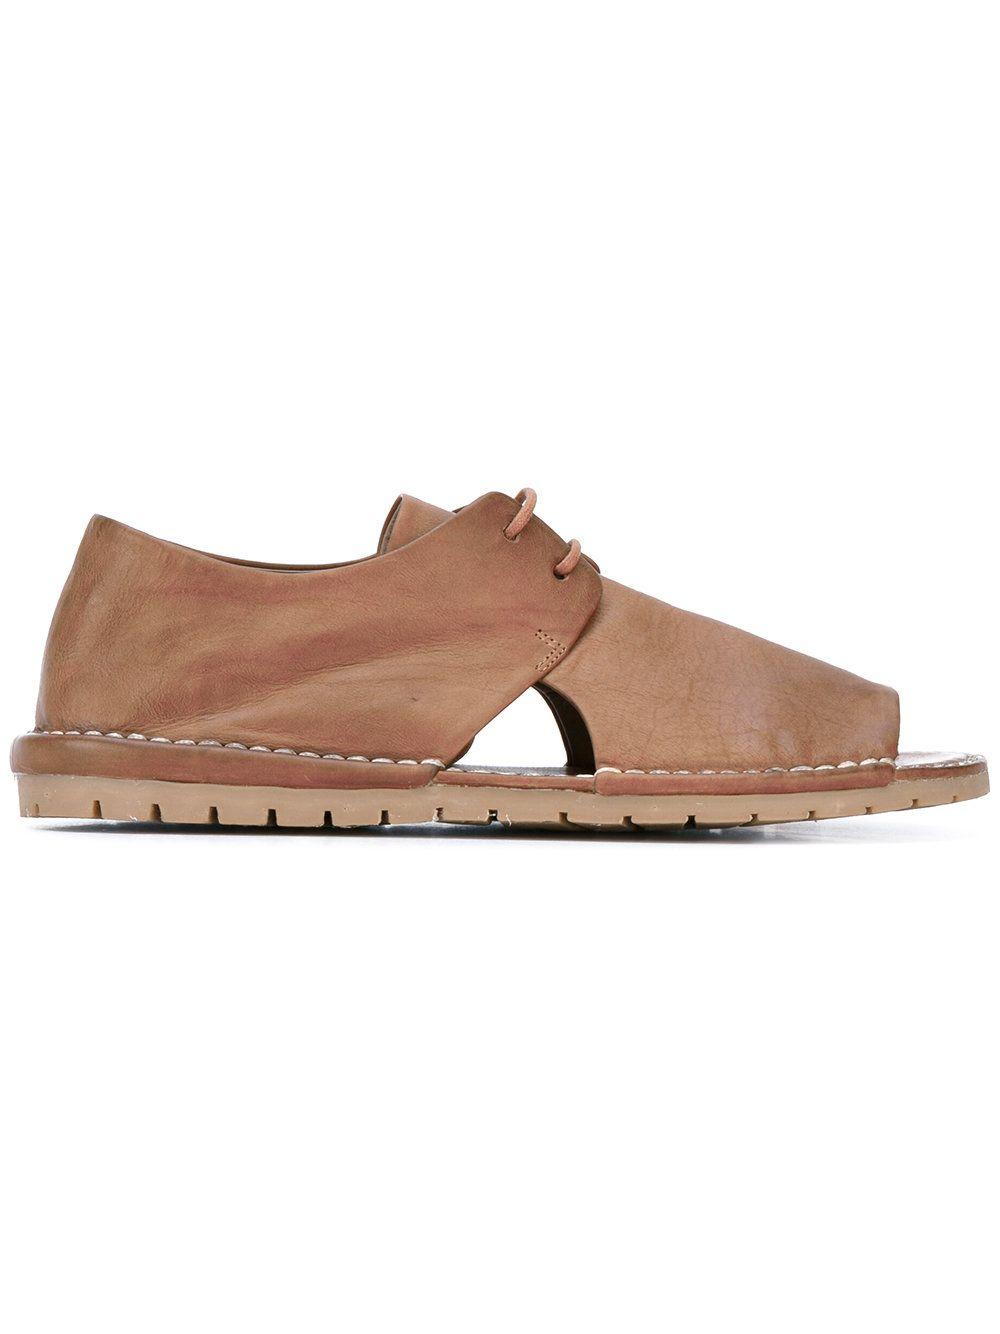 Marsèll open toe lace-up sandals